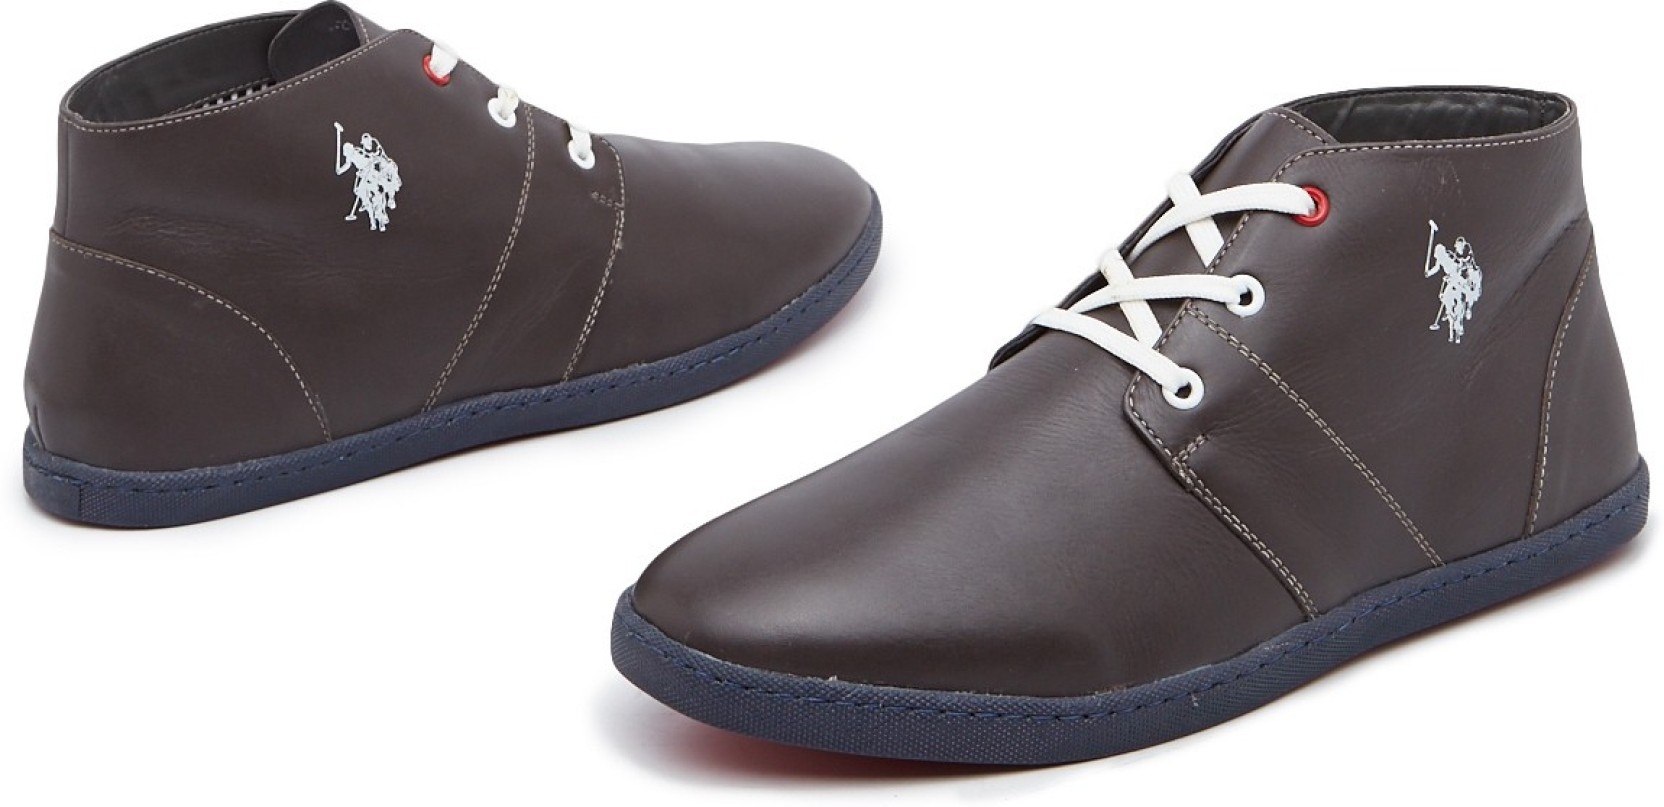 Best Minimalistic Sport Shoes